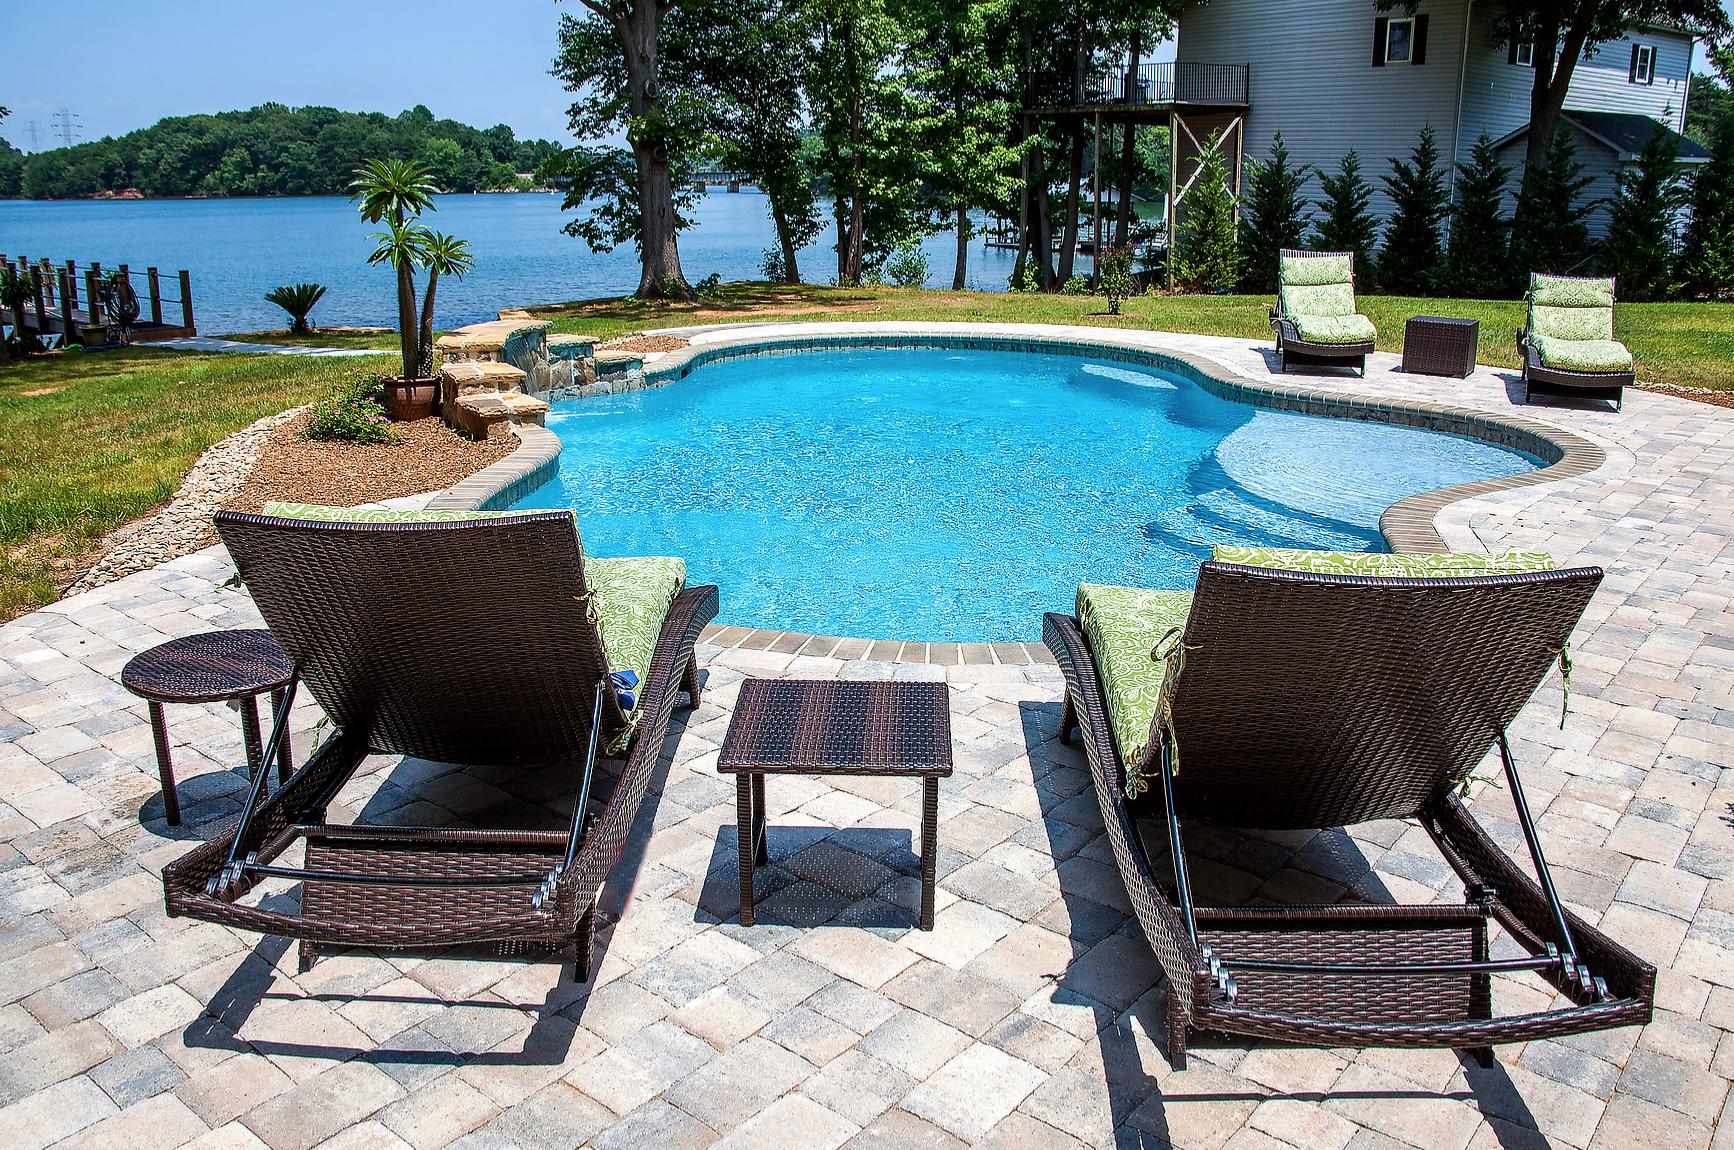 Cornelius North Carolina Inground Concrete Pool Installation Services Call 704-799-5236